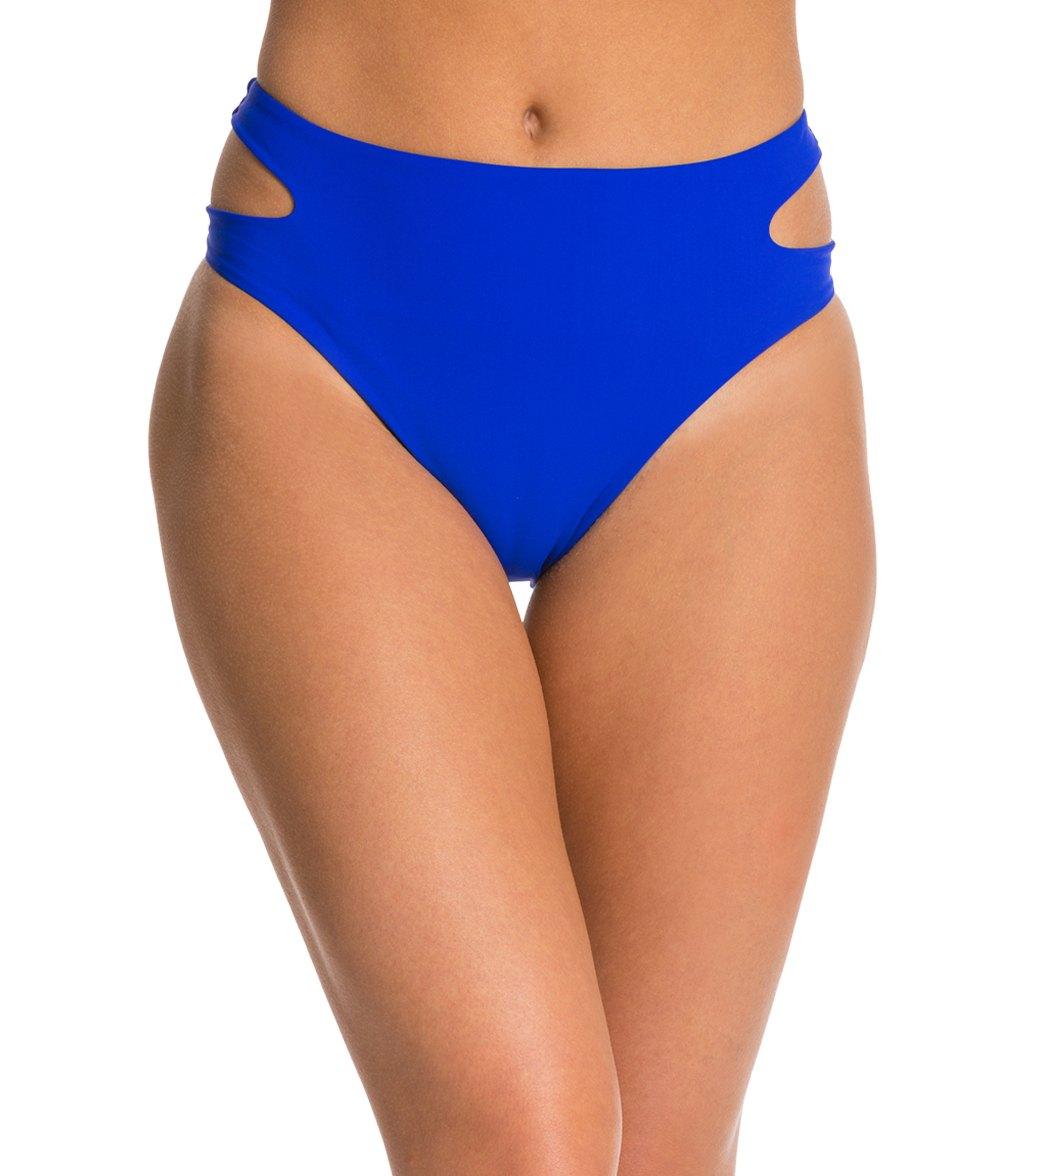 6b16b46fc8 ... Red Carter Splice & Dice Cut Out High Waist Bikini Bottom. MODEL  MEASUREMENTS